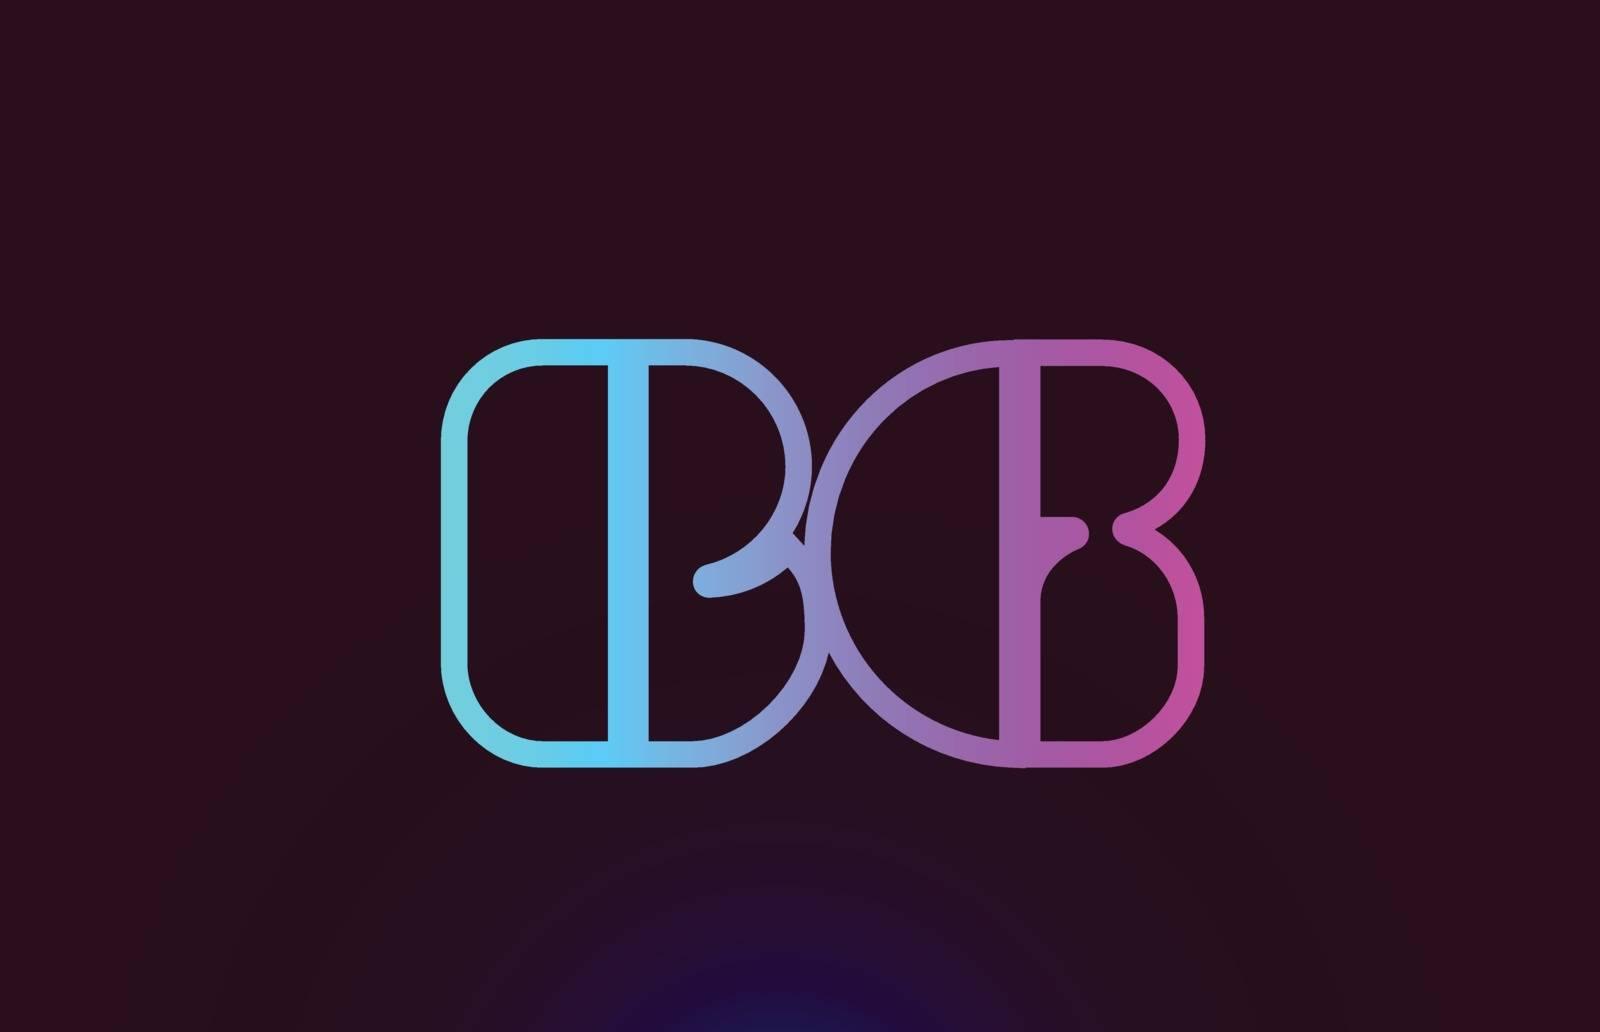 BG B G pink line alphabet letter combination logo icon design by dragomirescu